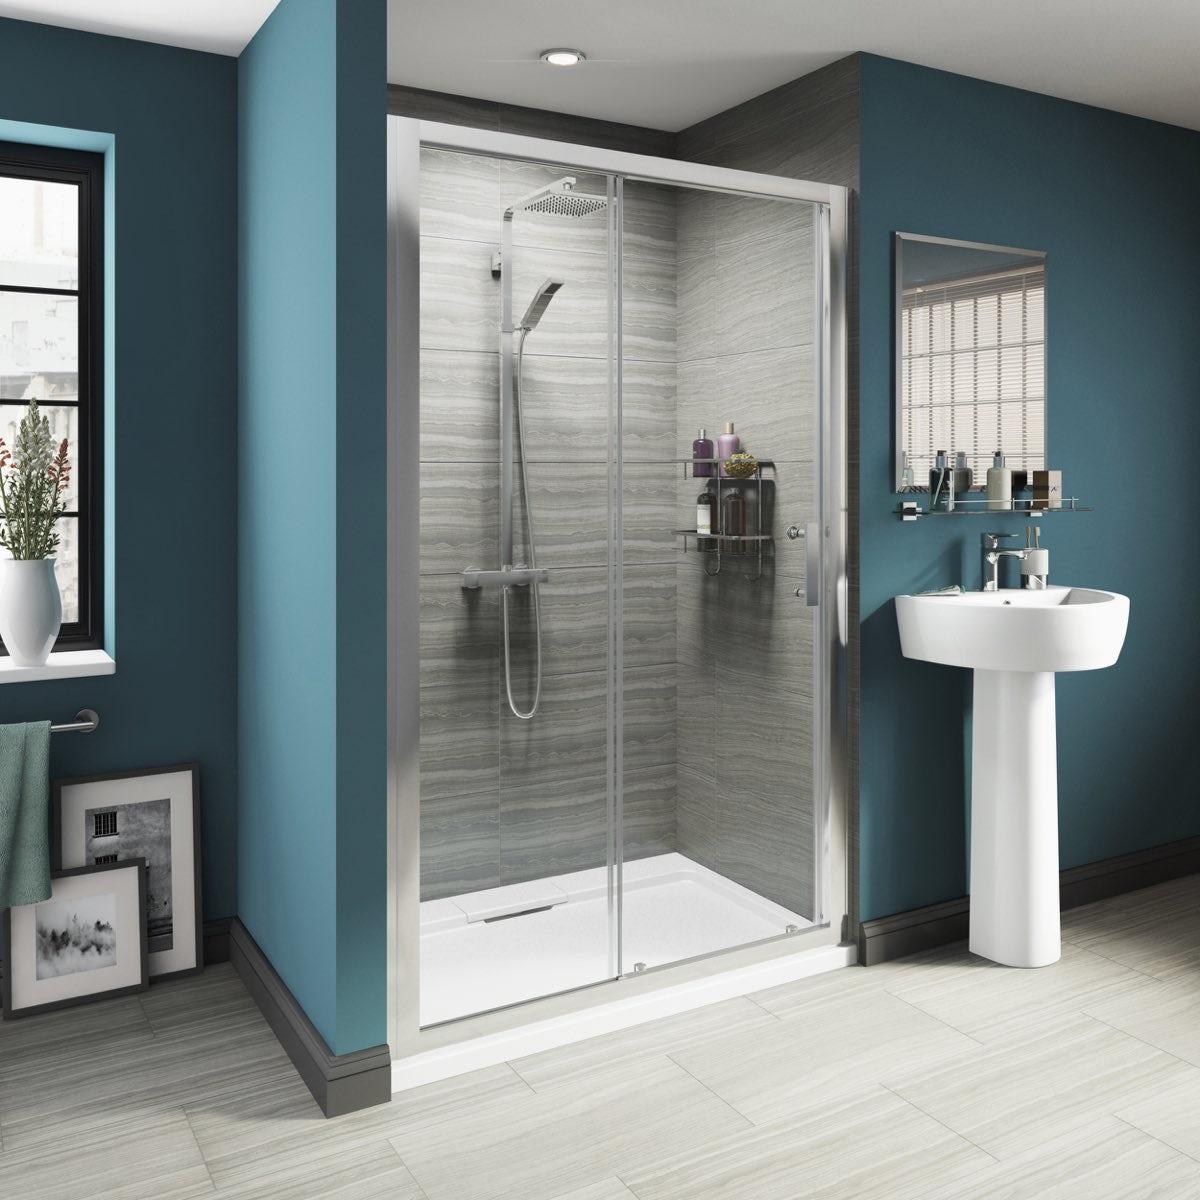 8mm framed sliding shower door 1200 with tray for 1200 shower door 8mm glass